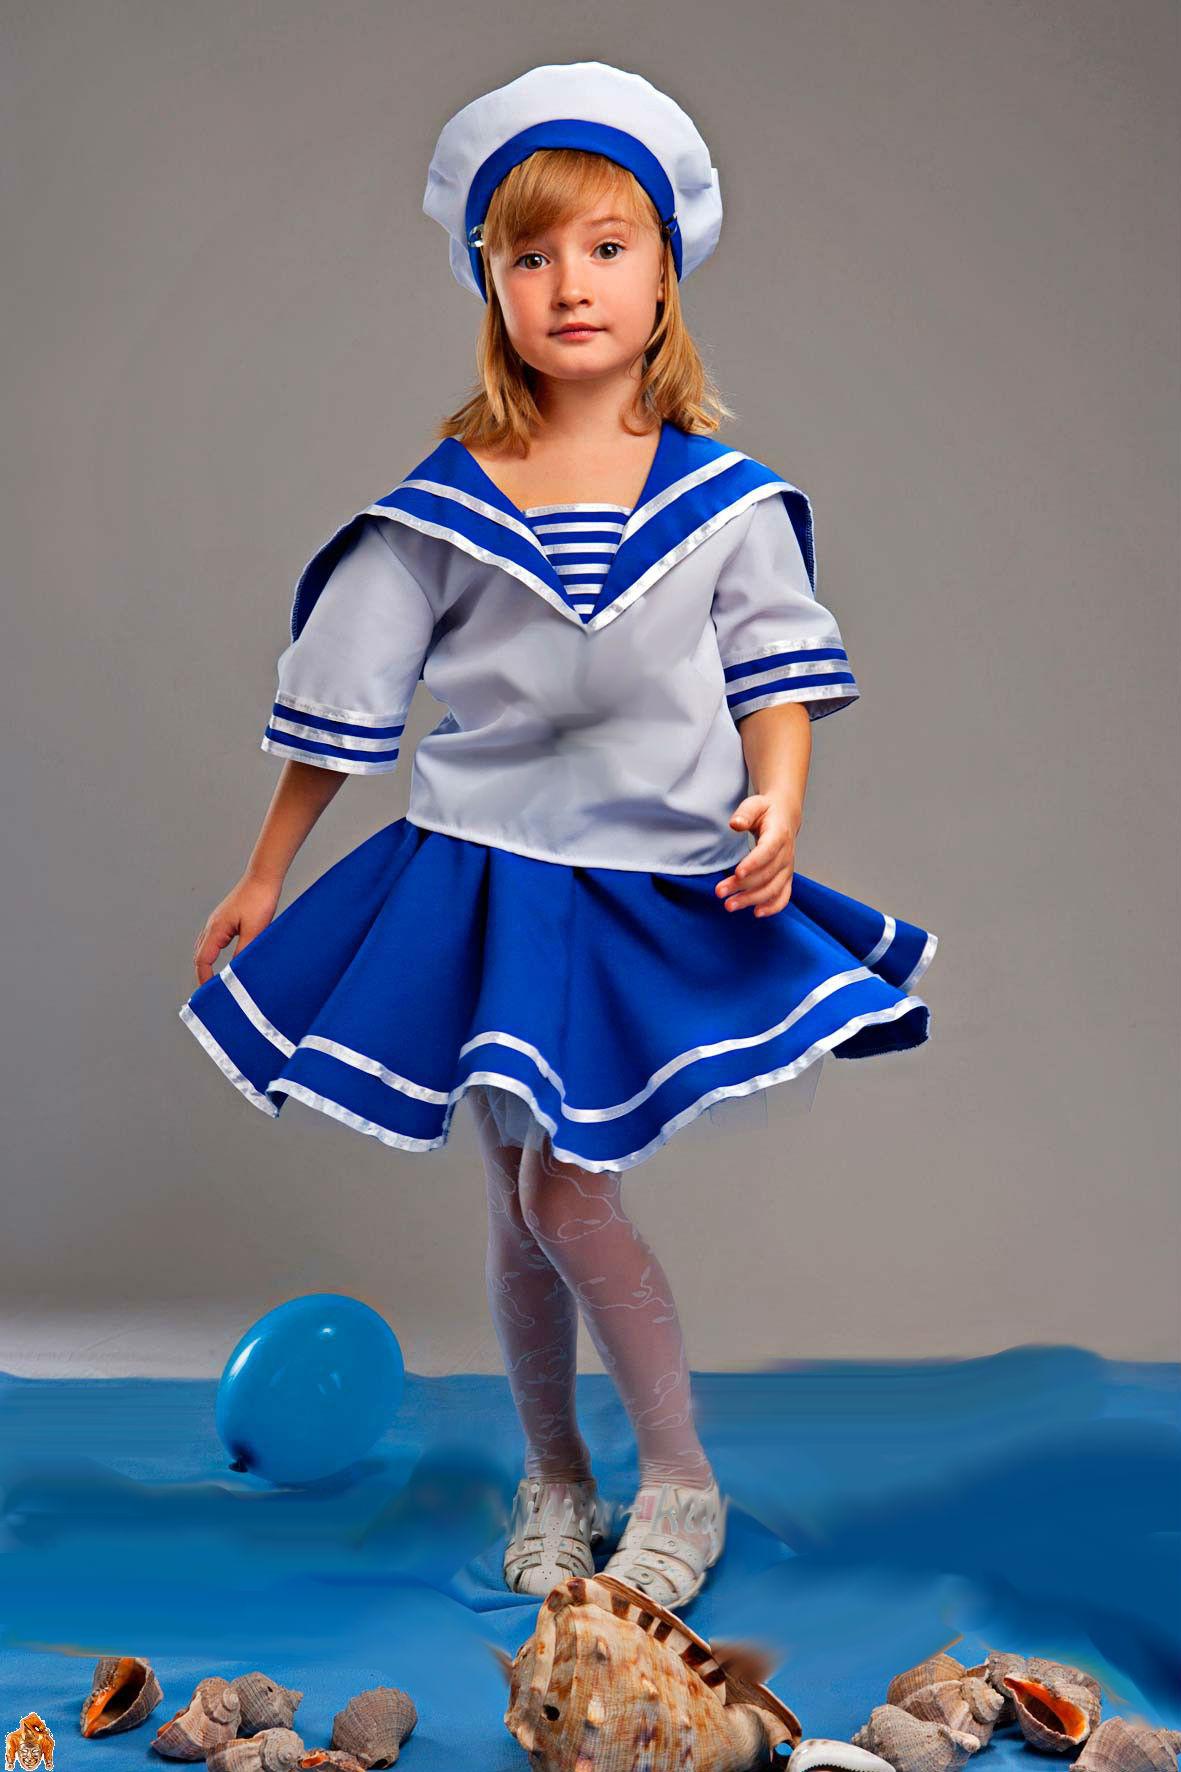 Костюм моряка для девочки своими руками